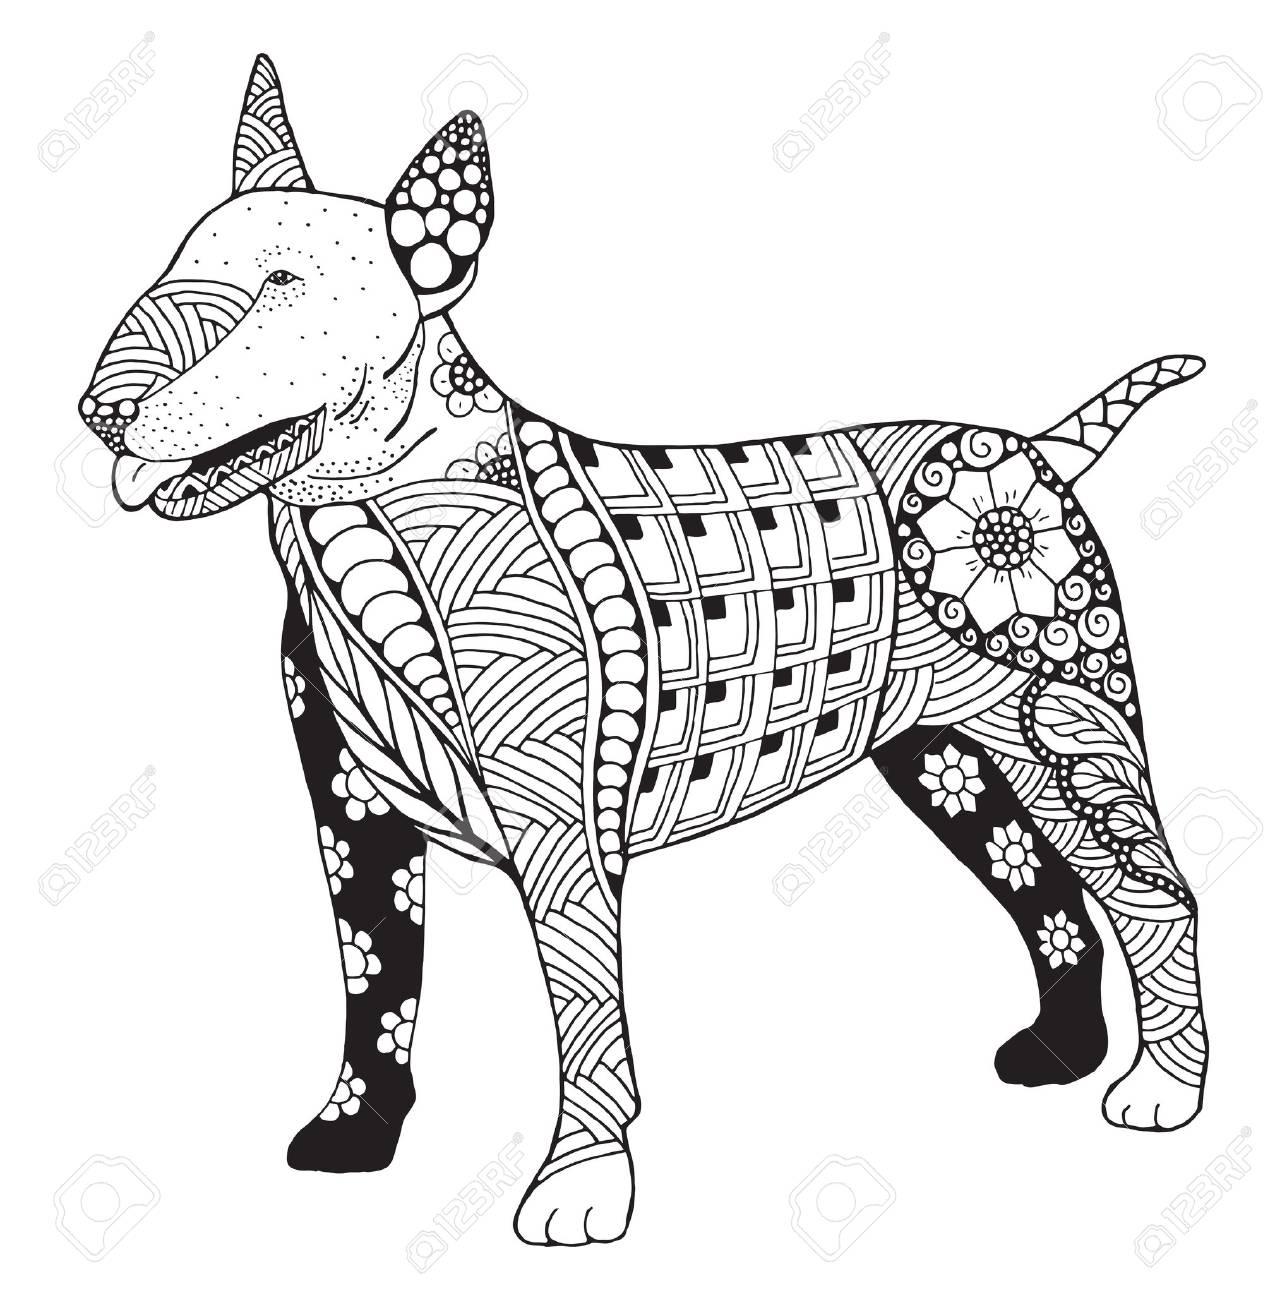 1287x1300 Bull Terrier Dog Zentangle Doodle Stylized, Vector, Illustration